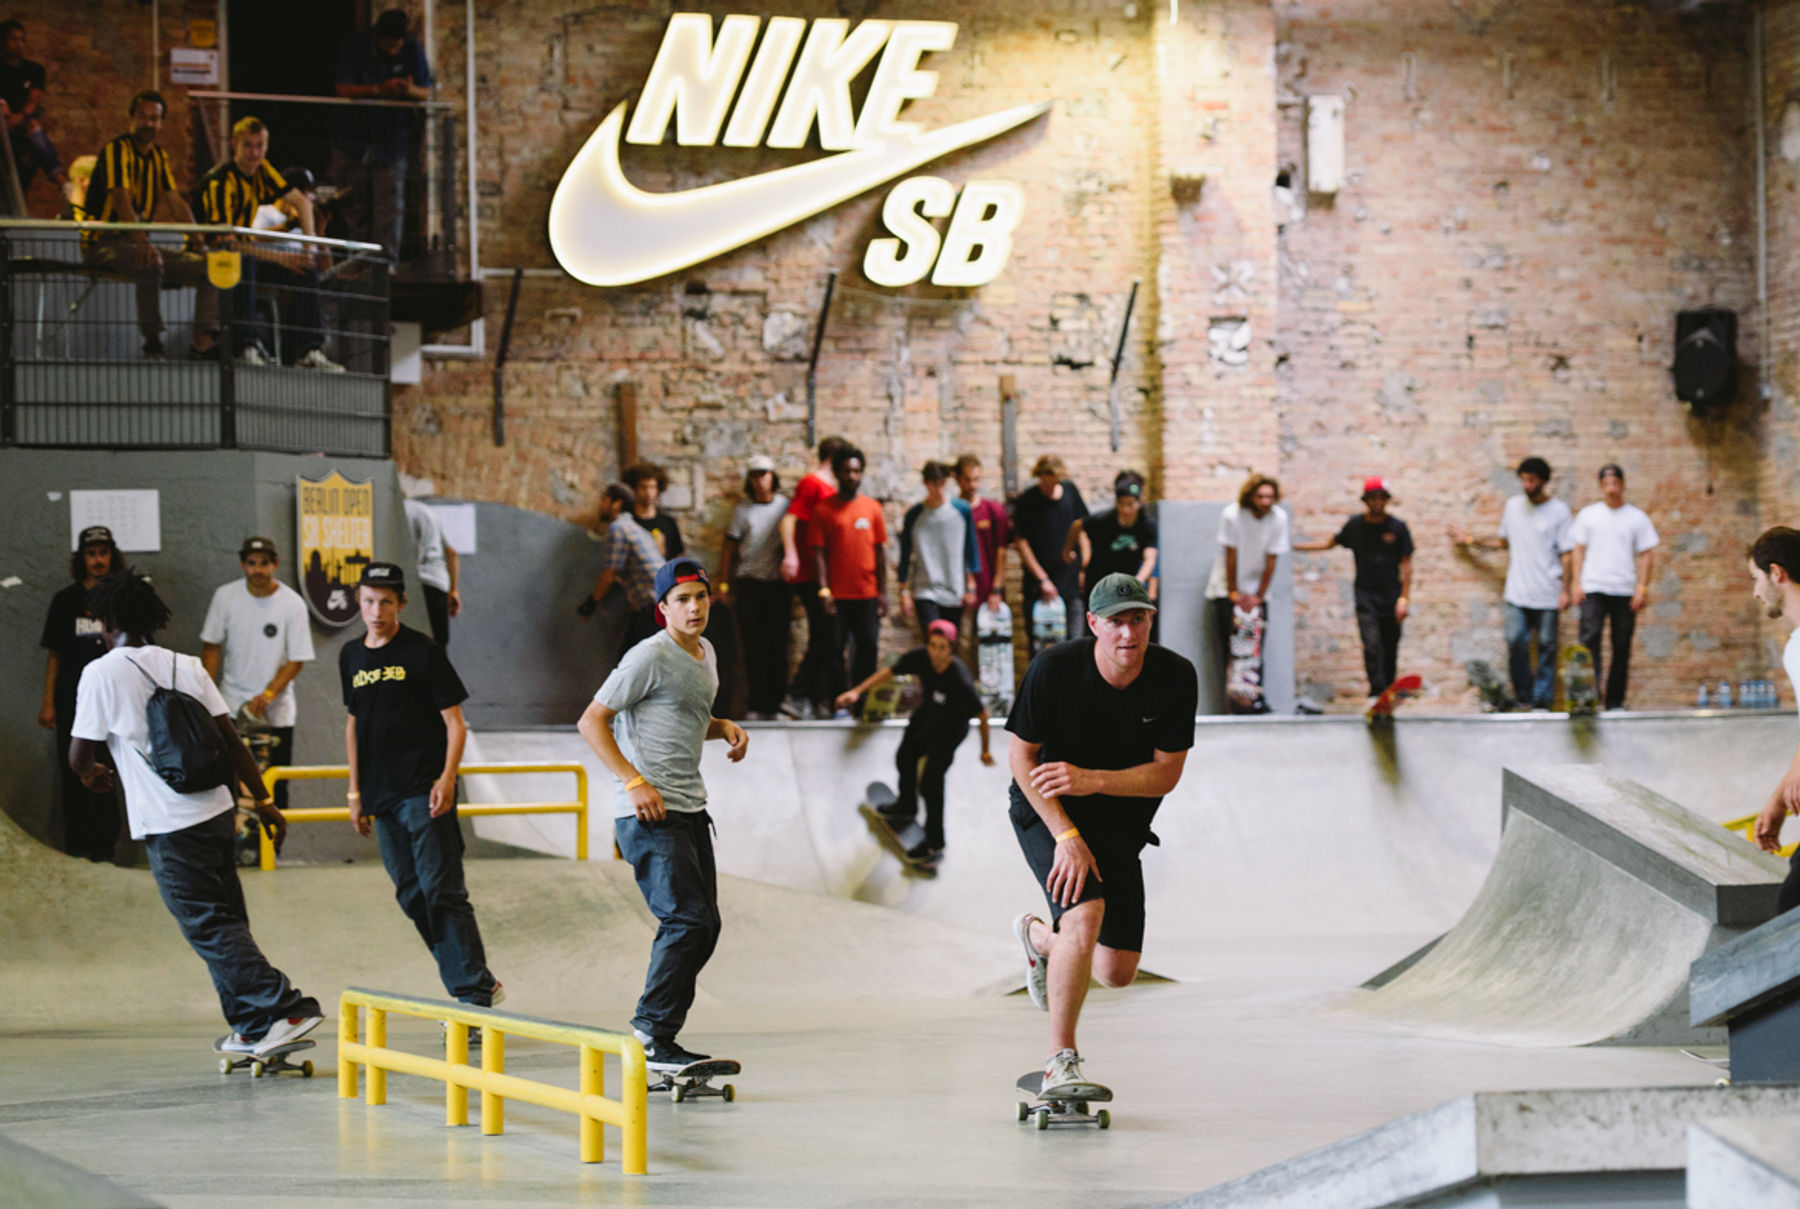 _IHC1349-Kilian-Zehnder-Aurelien-Giraud-Hjalte-Halberg-Nike-SB-Berlin-Open-Day-1-July-2015-Photographer-Maksim-Kalanep